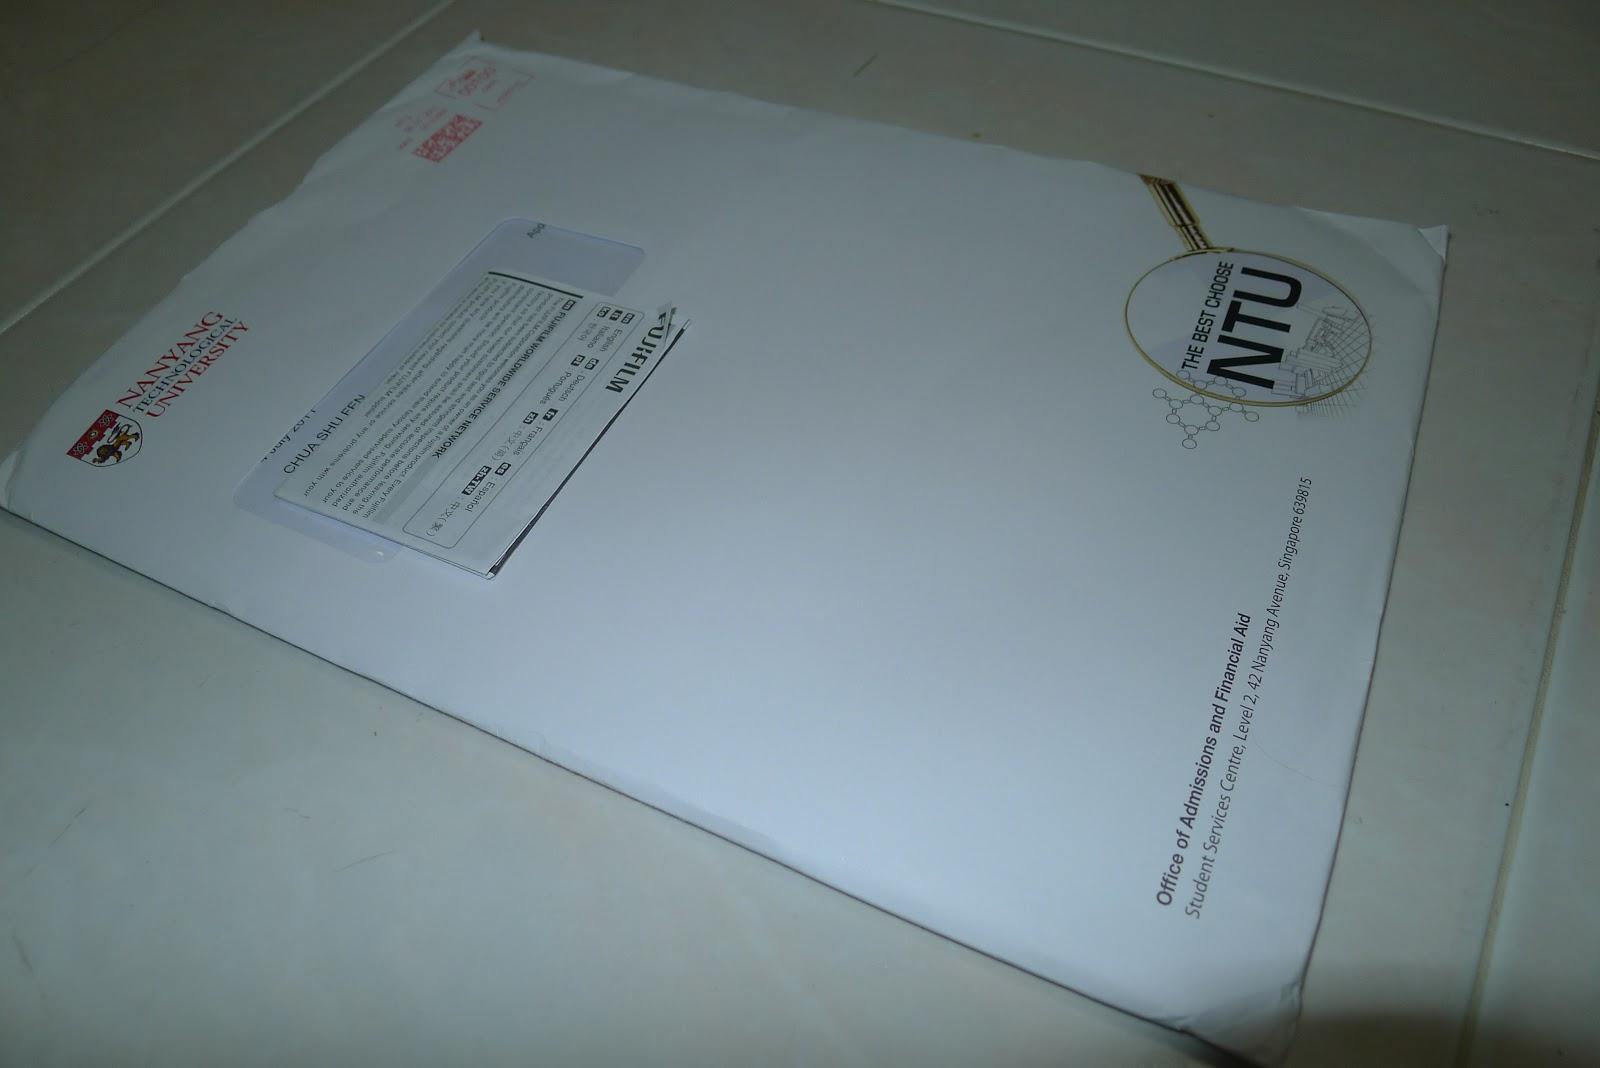 Solitous Diaspora 434 Ntu S Letter Of Acceptance